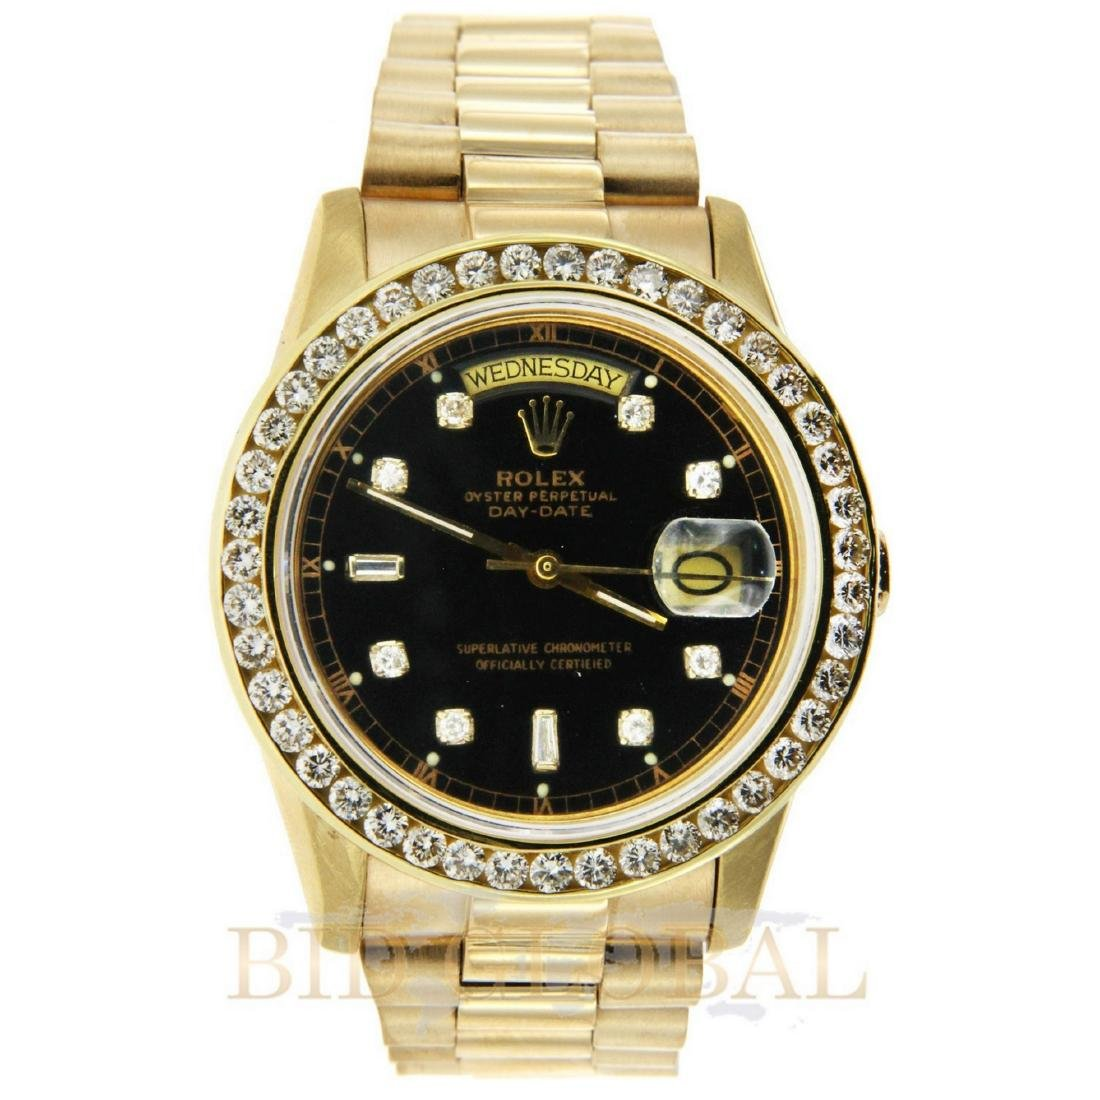 Rolex Day Date Gold Diamond Watch.